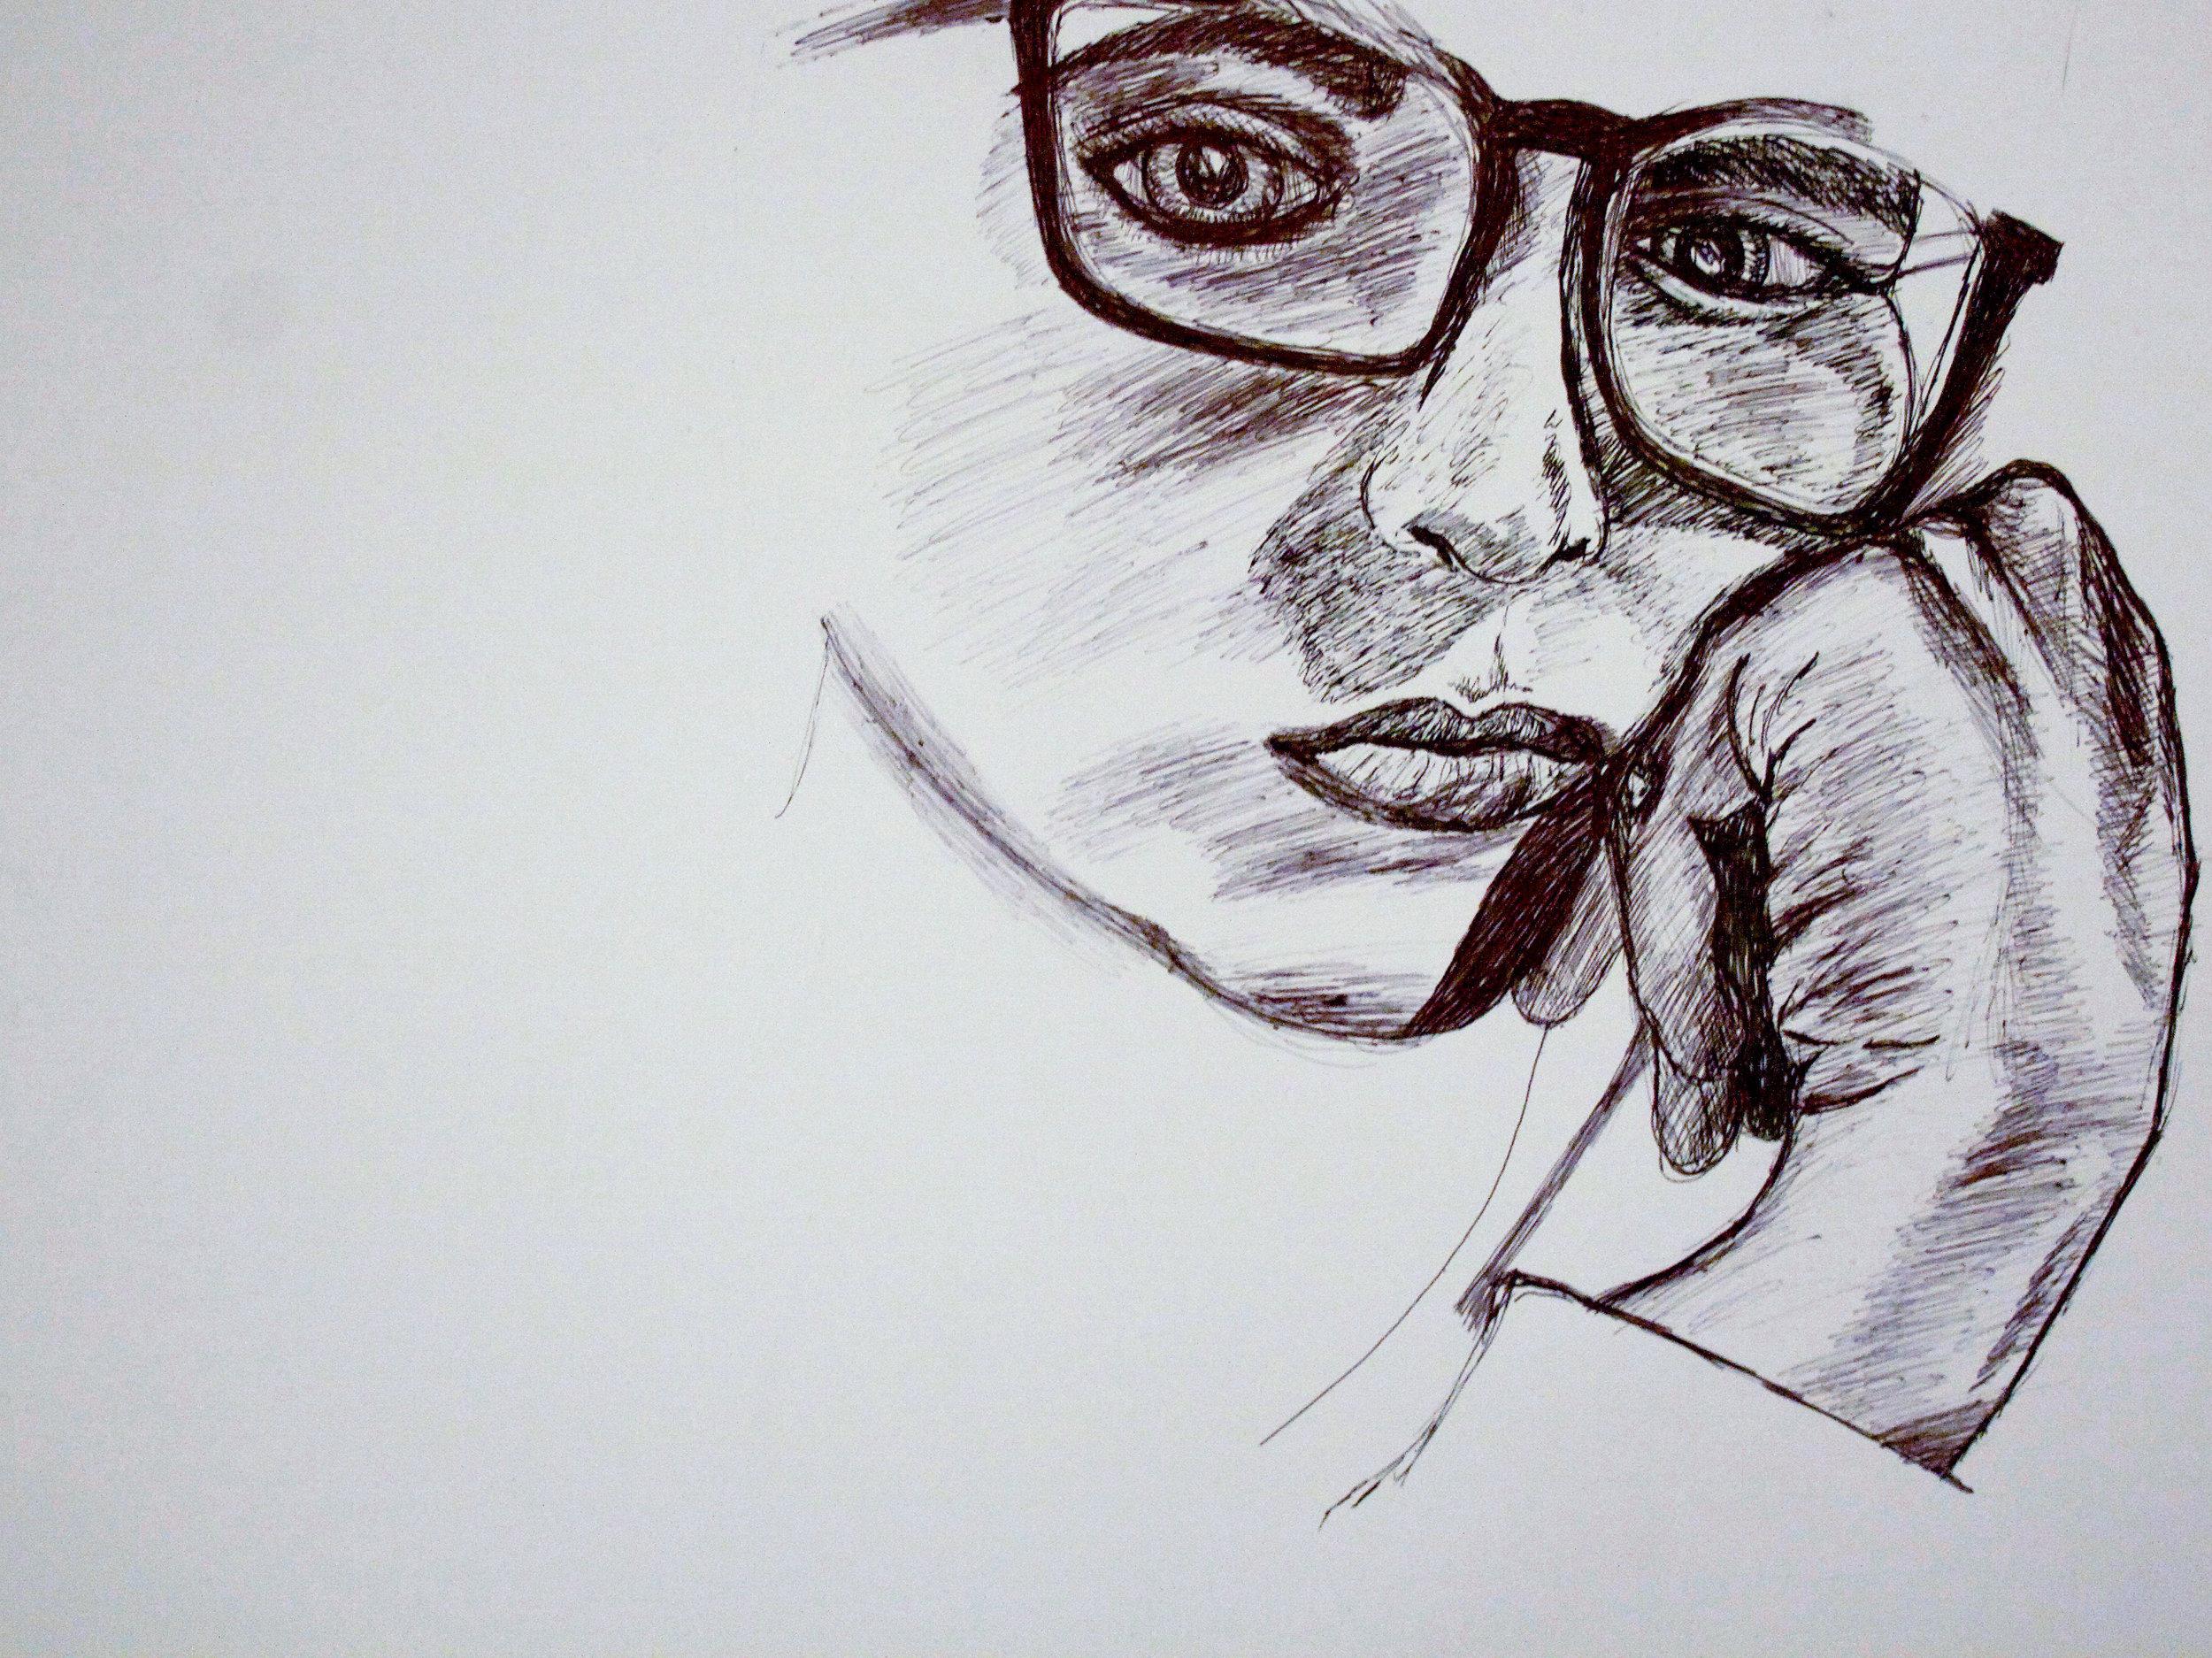 Self-Portrait 6